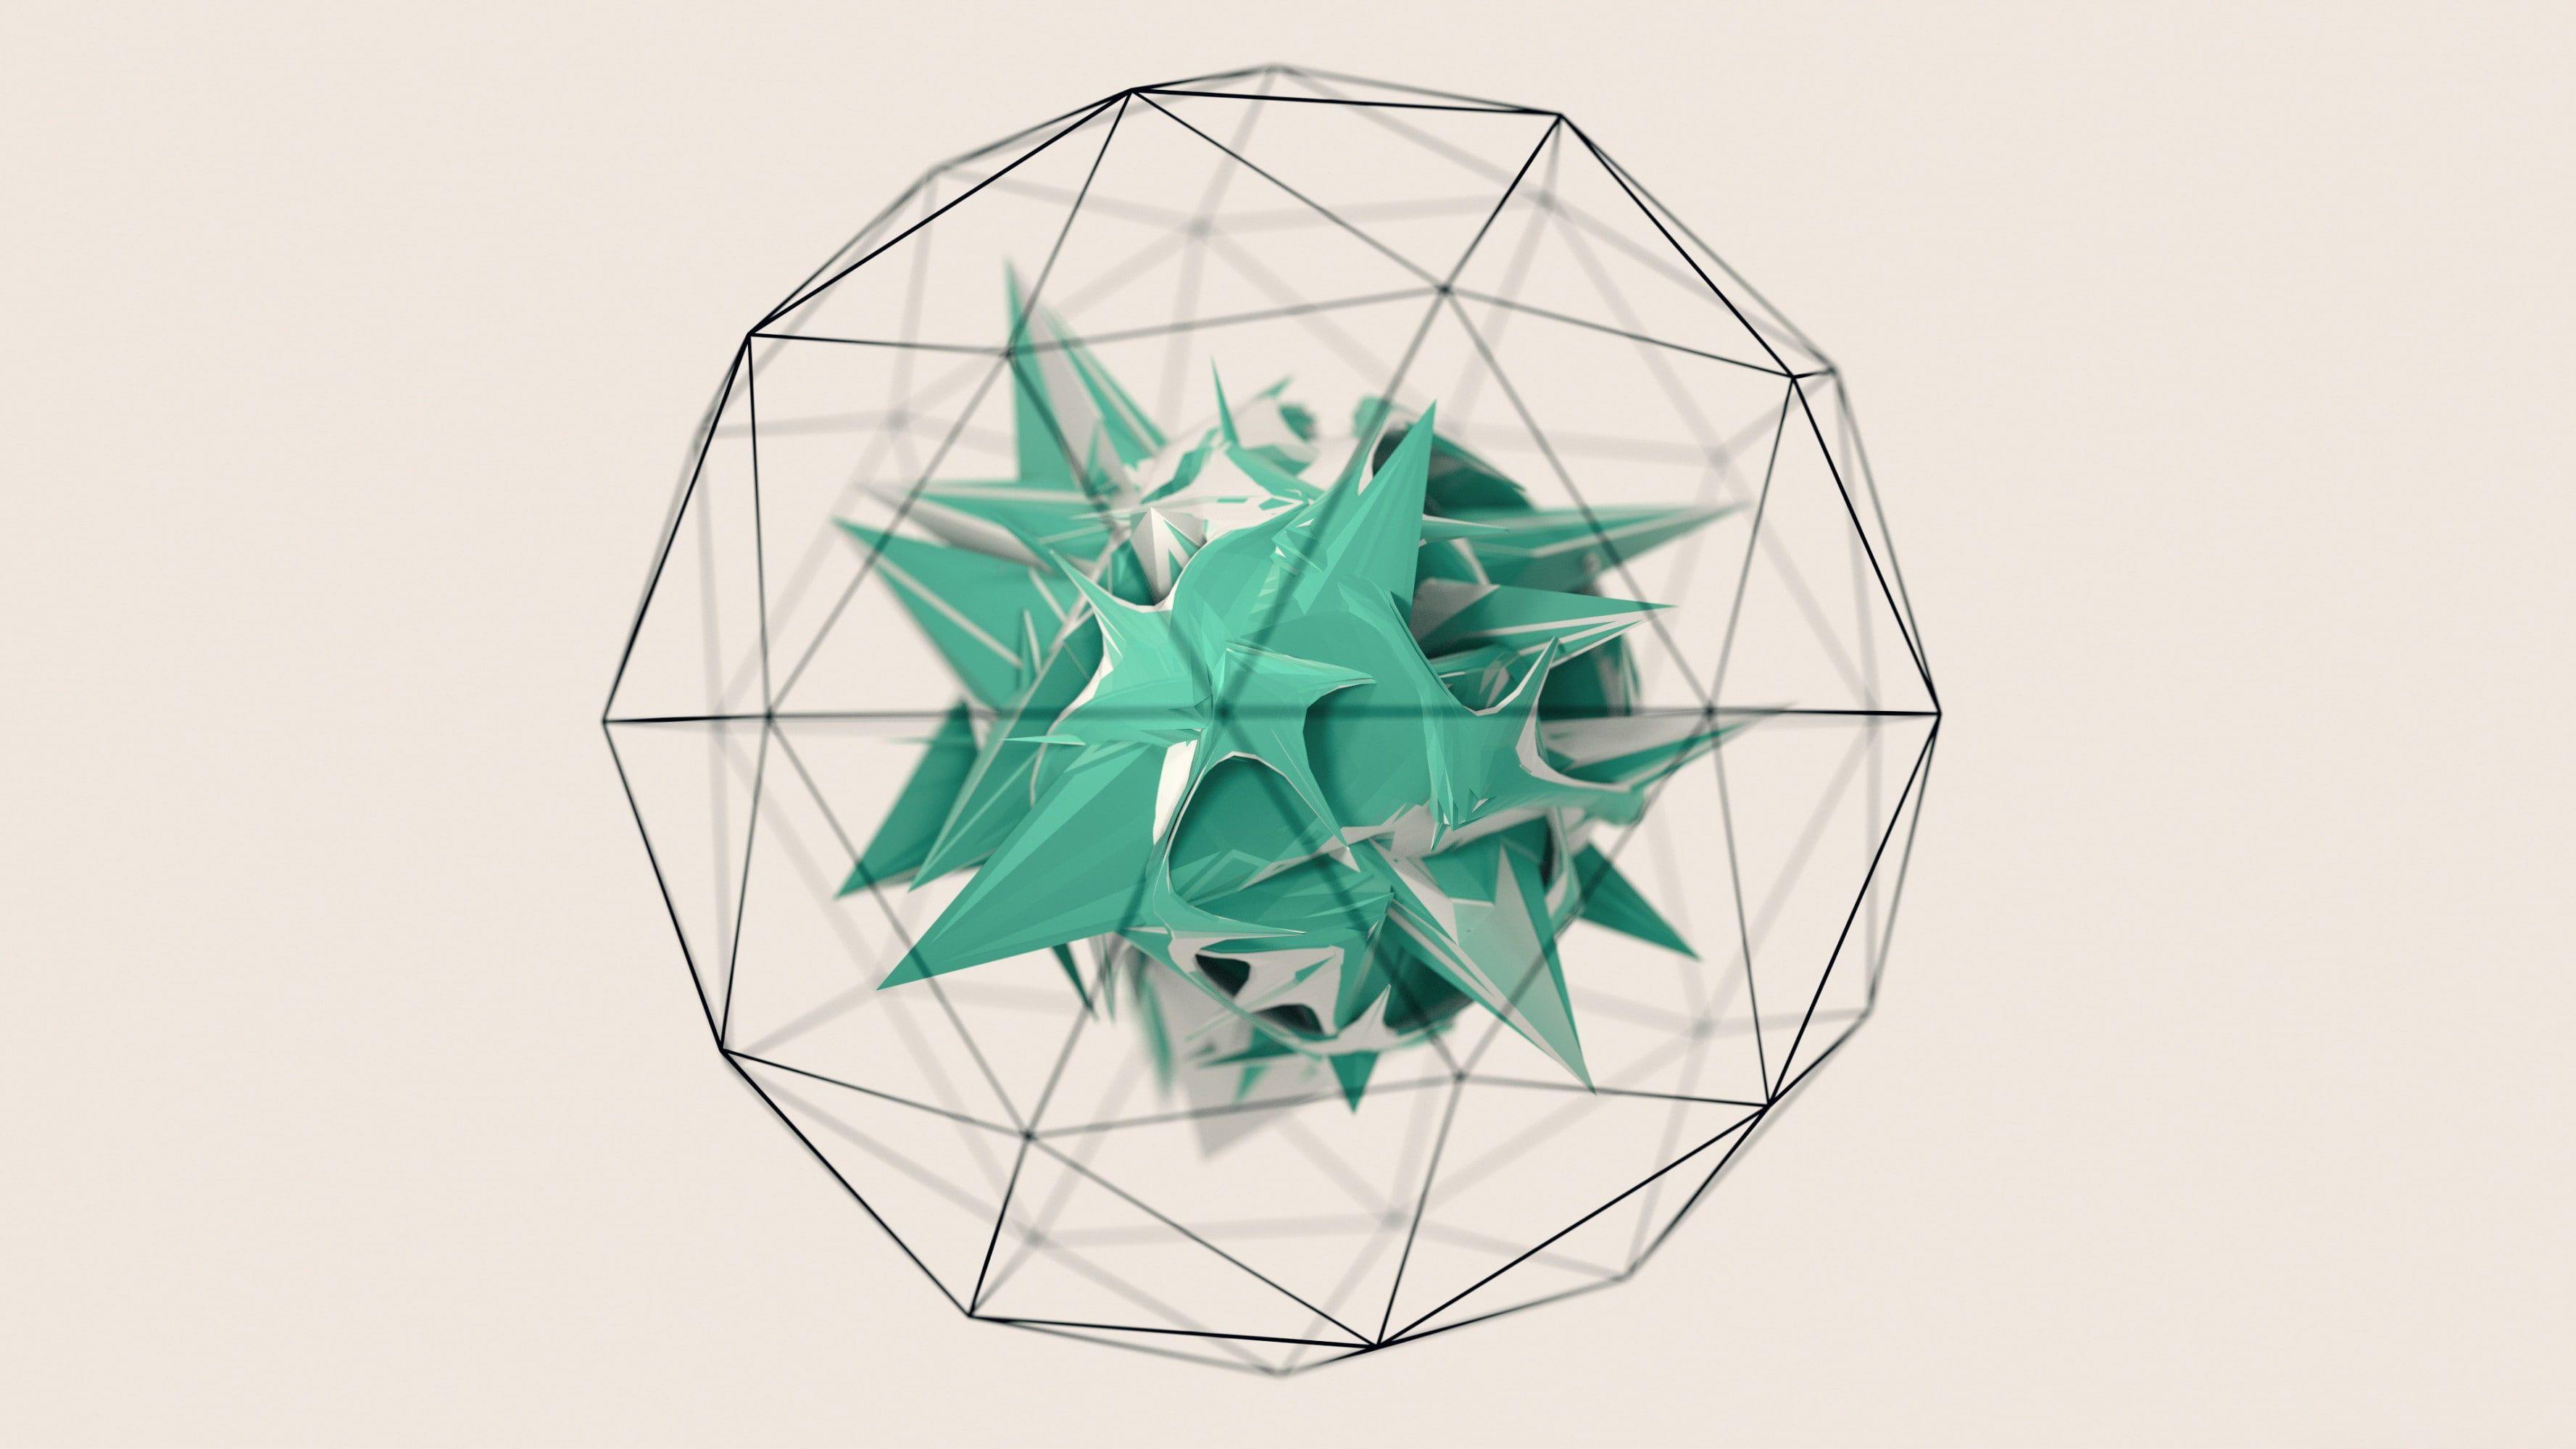 geometry minimalism low poly 2K wallpaper hdwallpaper